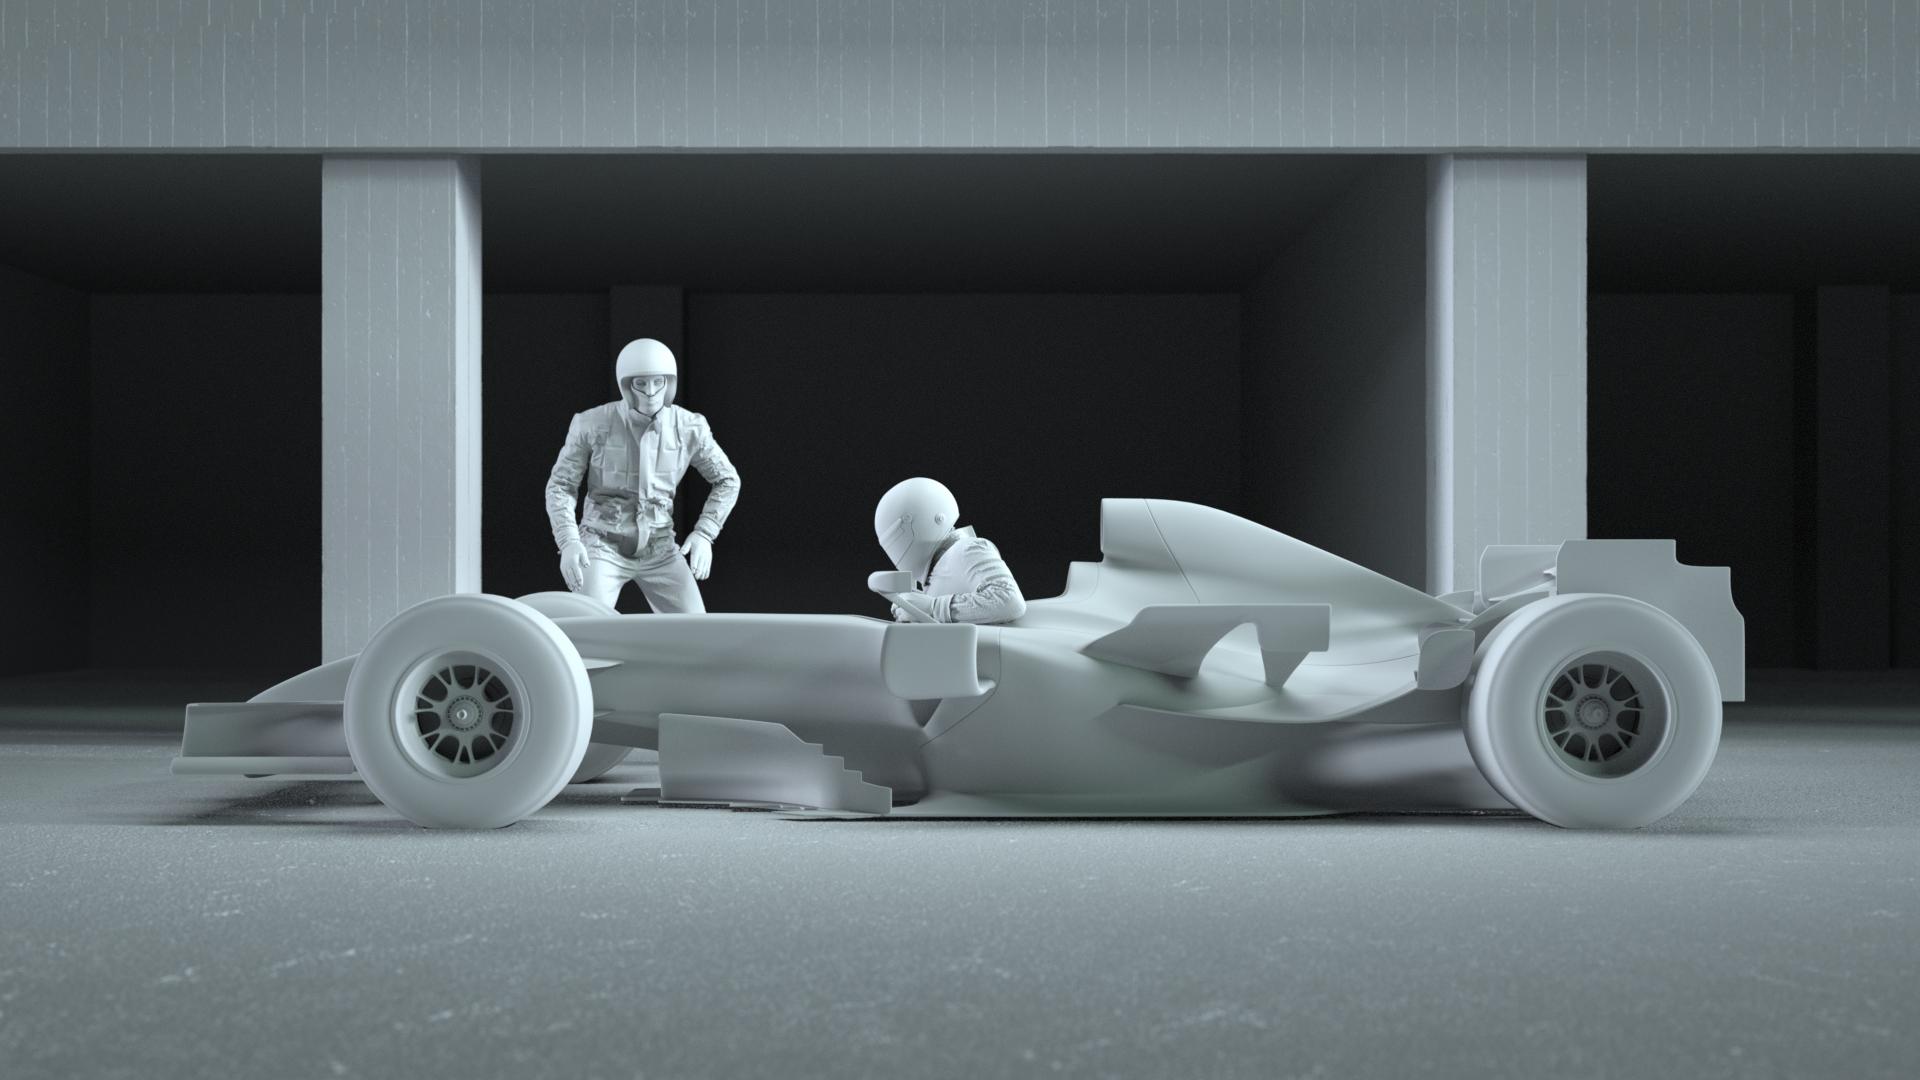 2020 car render challenge - Glory Days